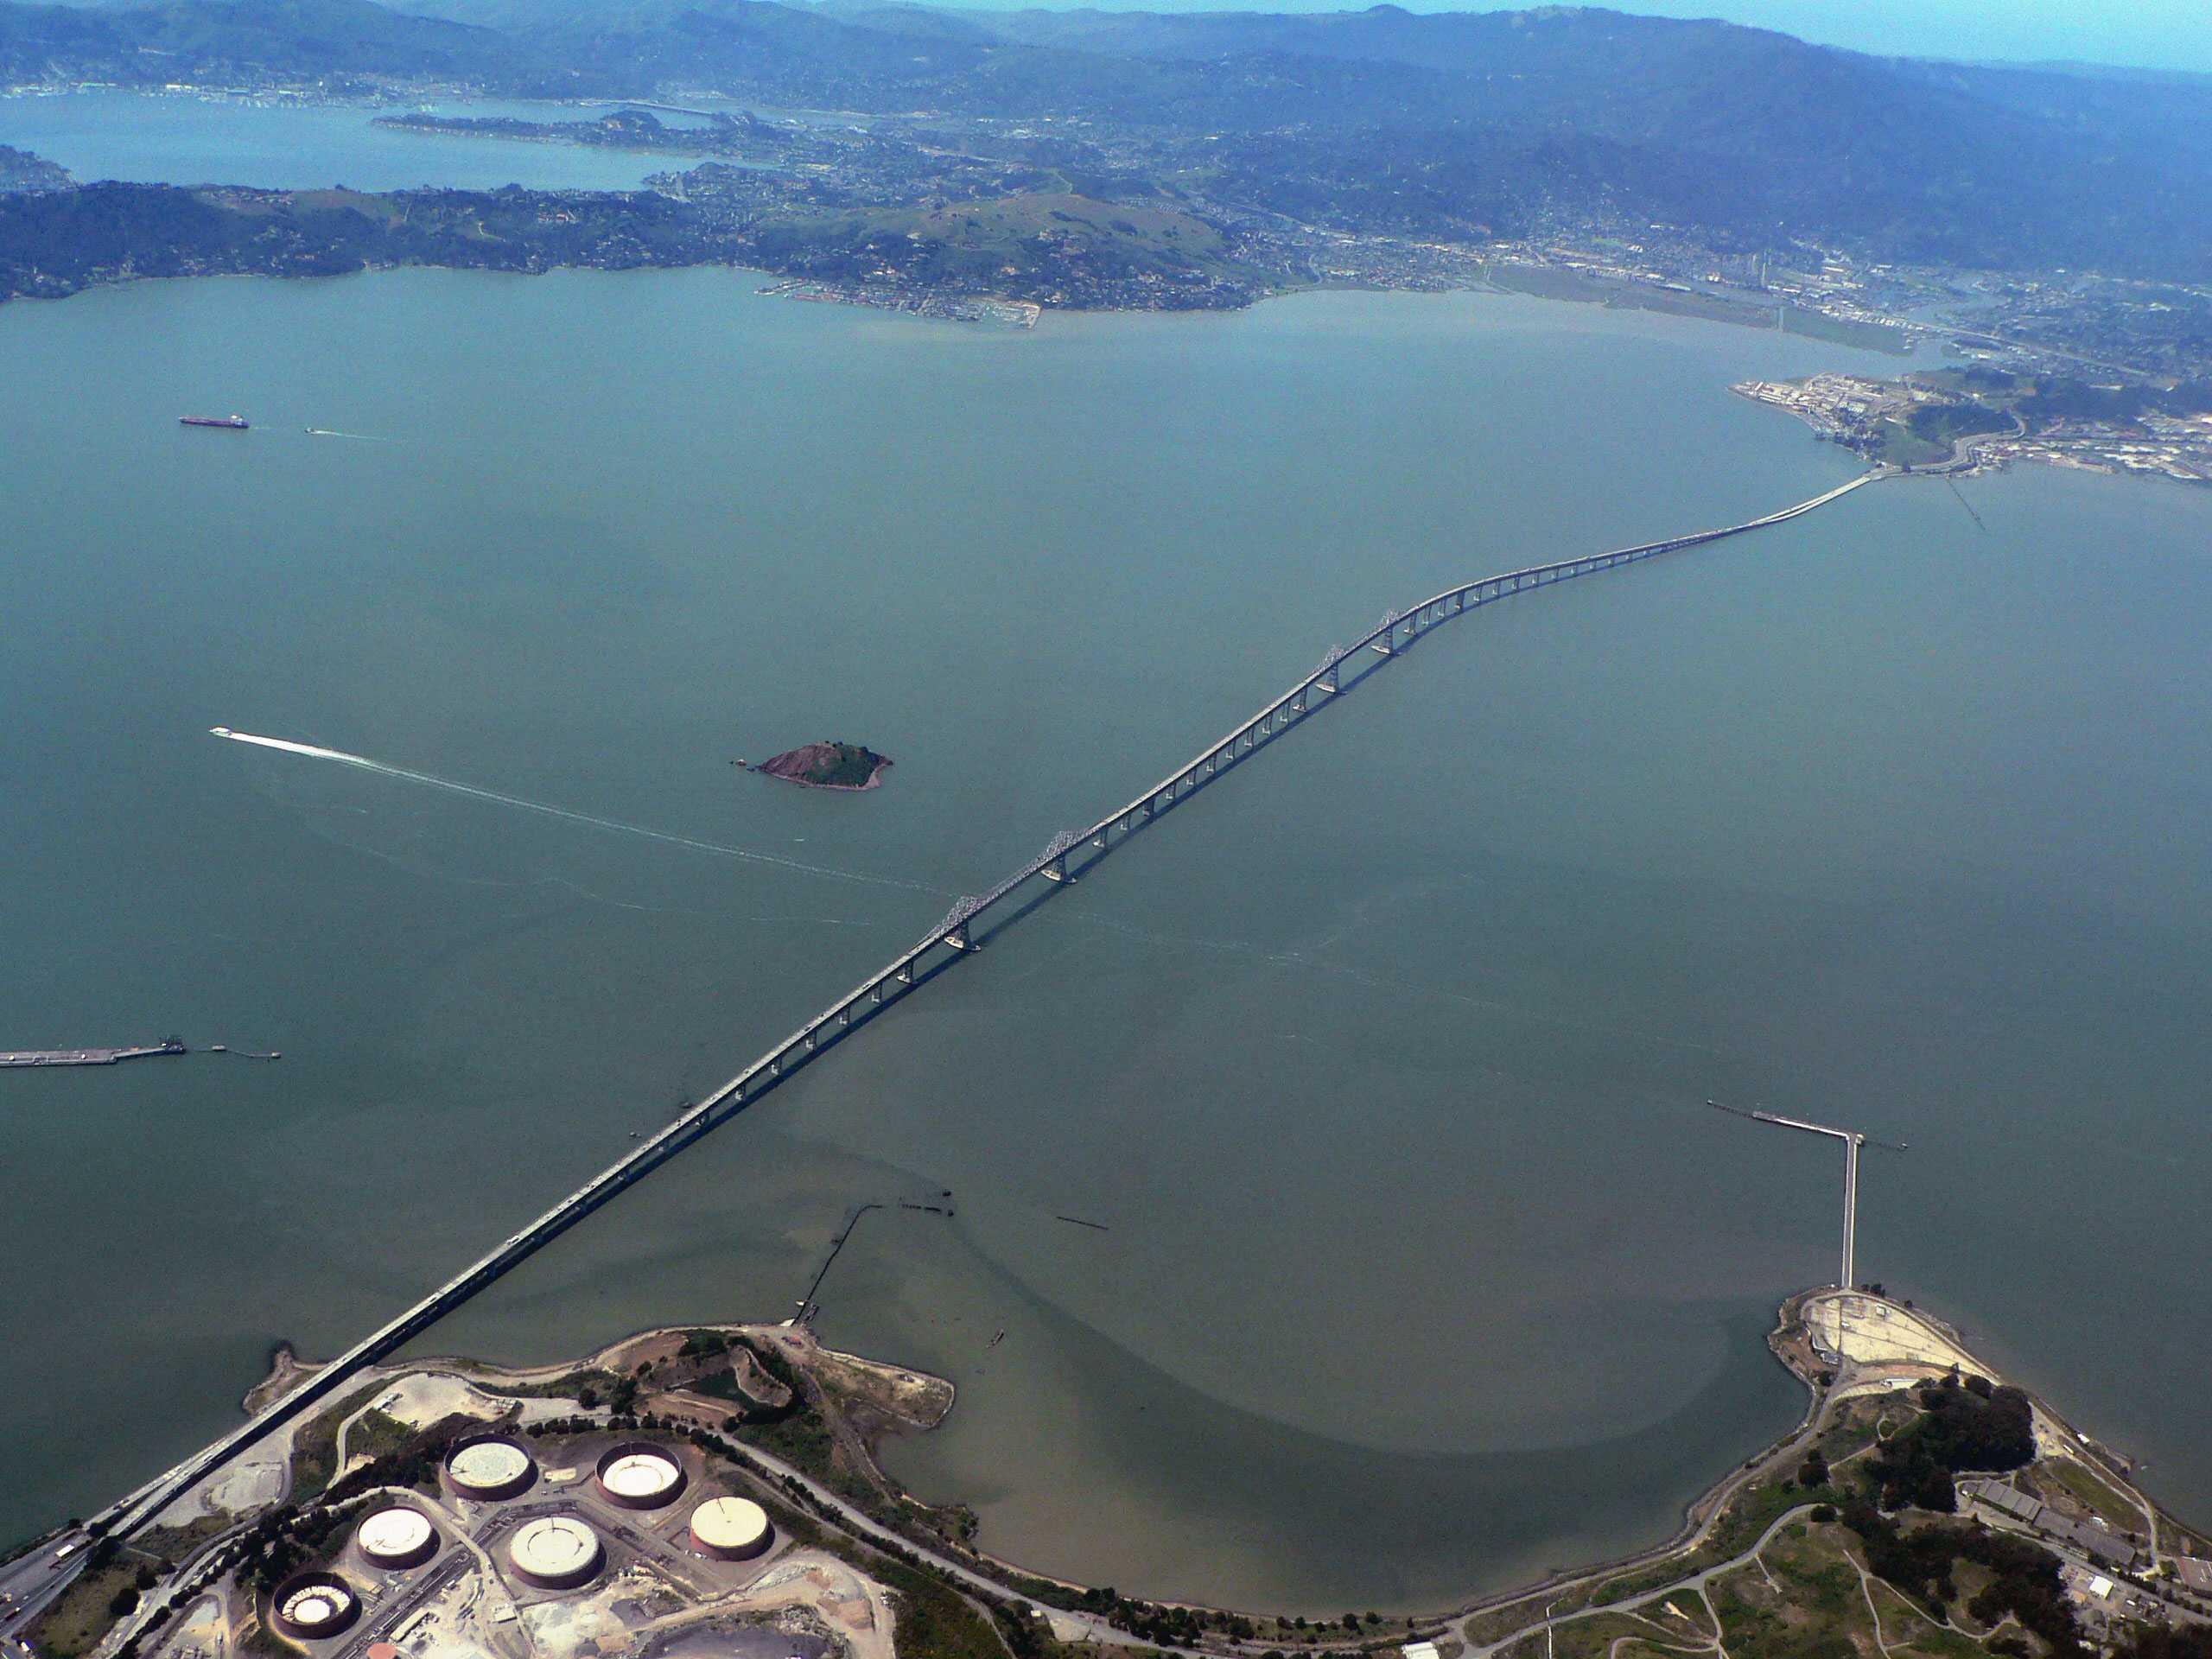 Update: Falling debris creates traffic standstill on Richmond-San Rafael Bridge